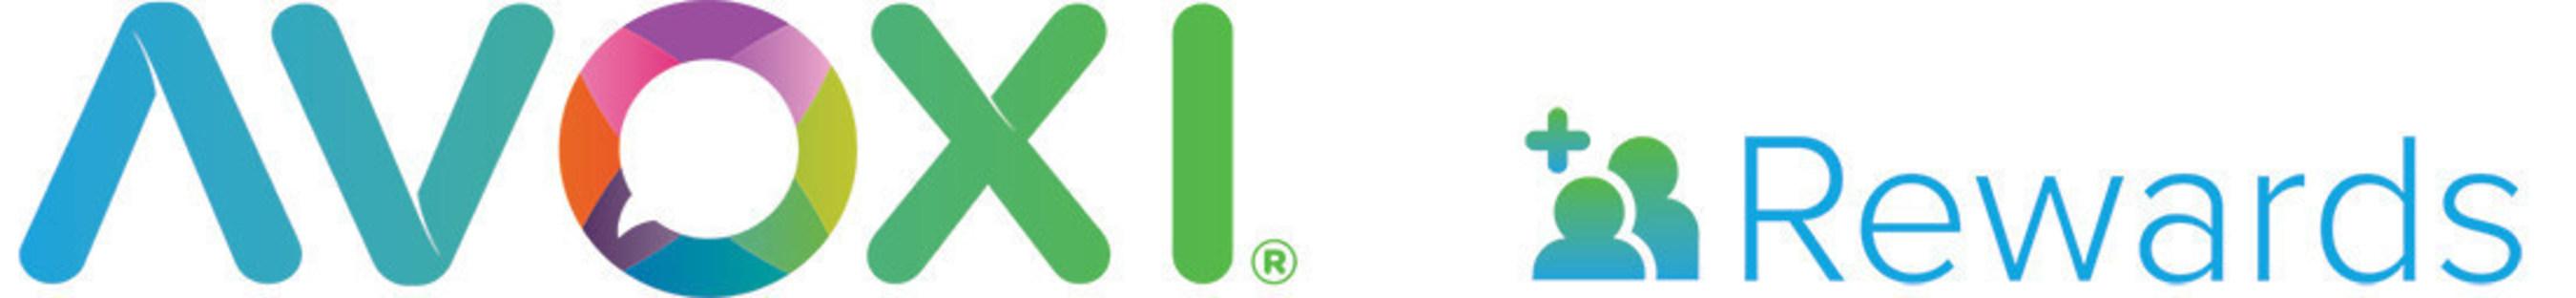 AVOXI Launches AVOXI Rewards Referral Program